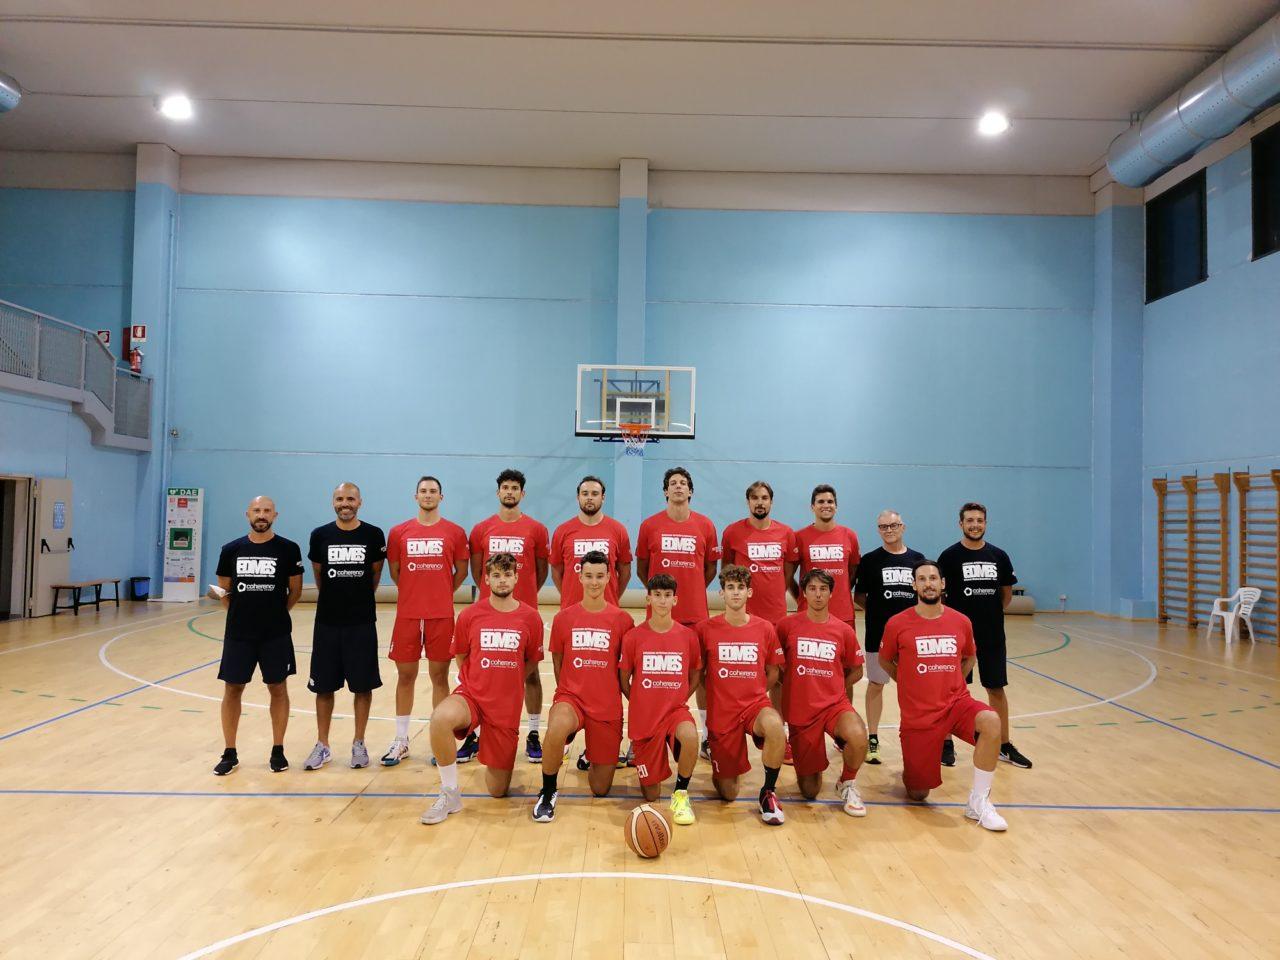 https://www.sanmaurense.it/basket/wp-content/uploads/2021/08/Foto-di-squadra-1280x960.jpg